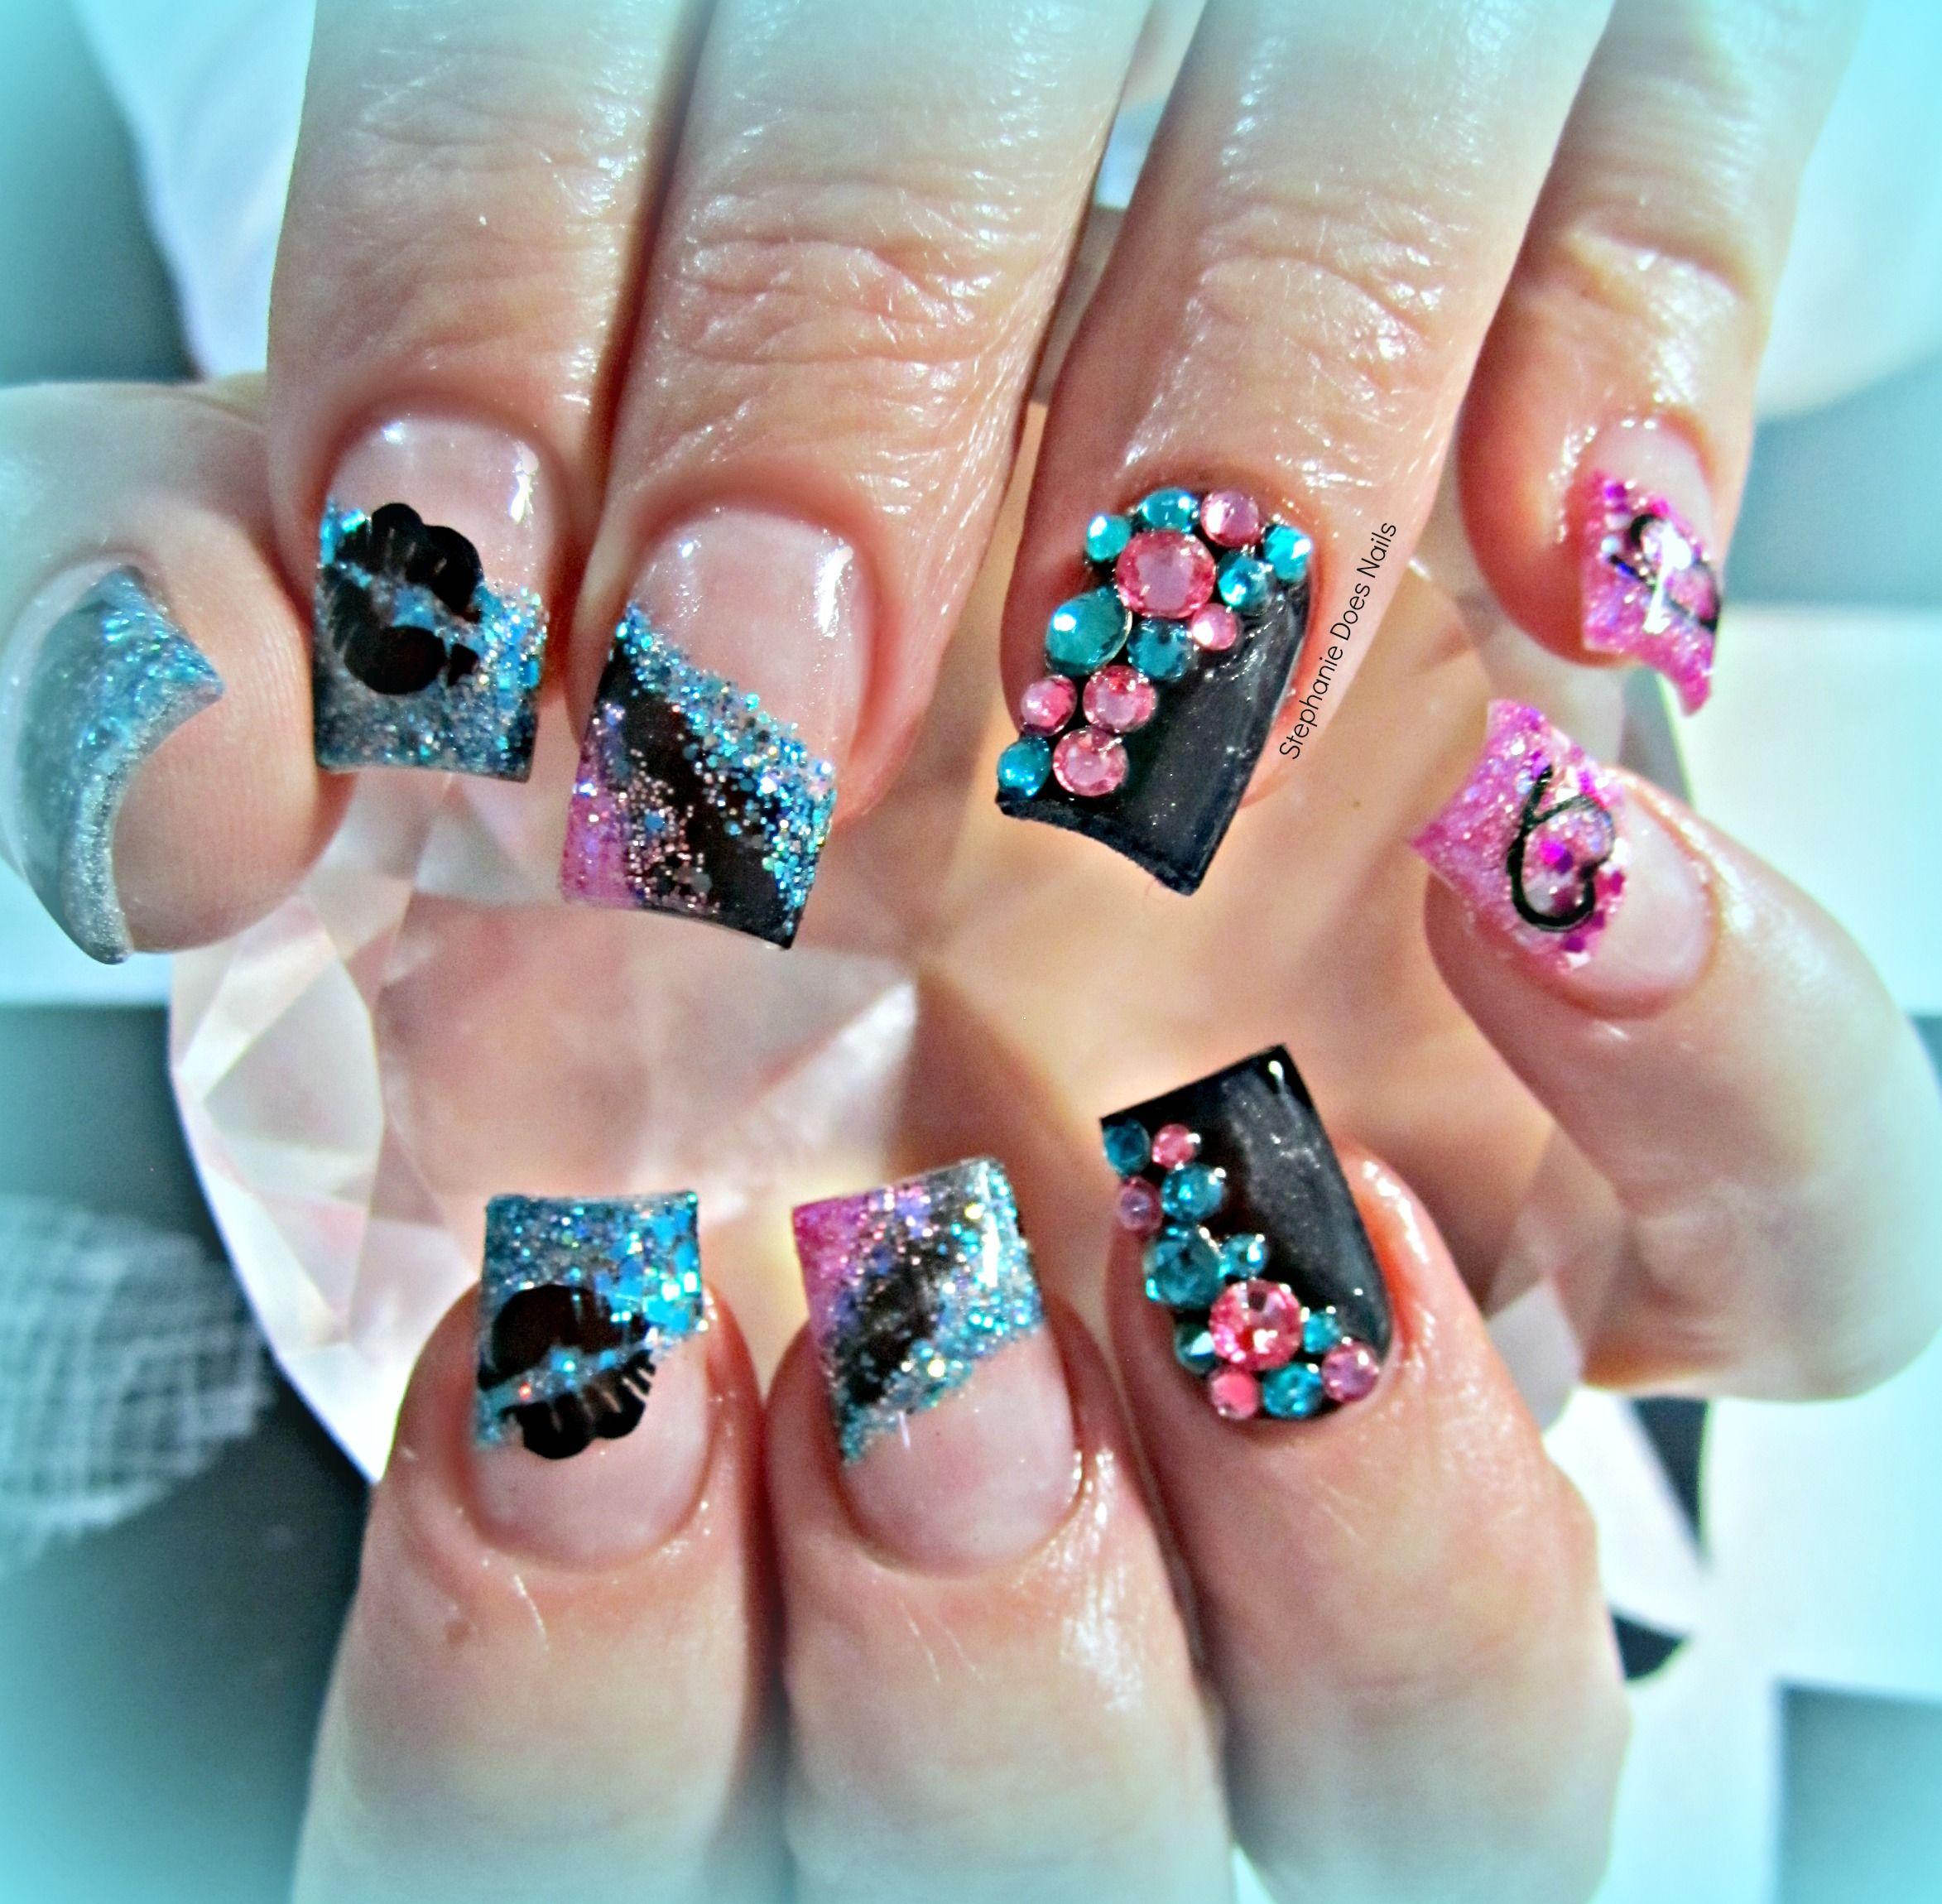 Pink blue and black acrylic nails | Nails | Pinterest | Black ...